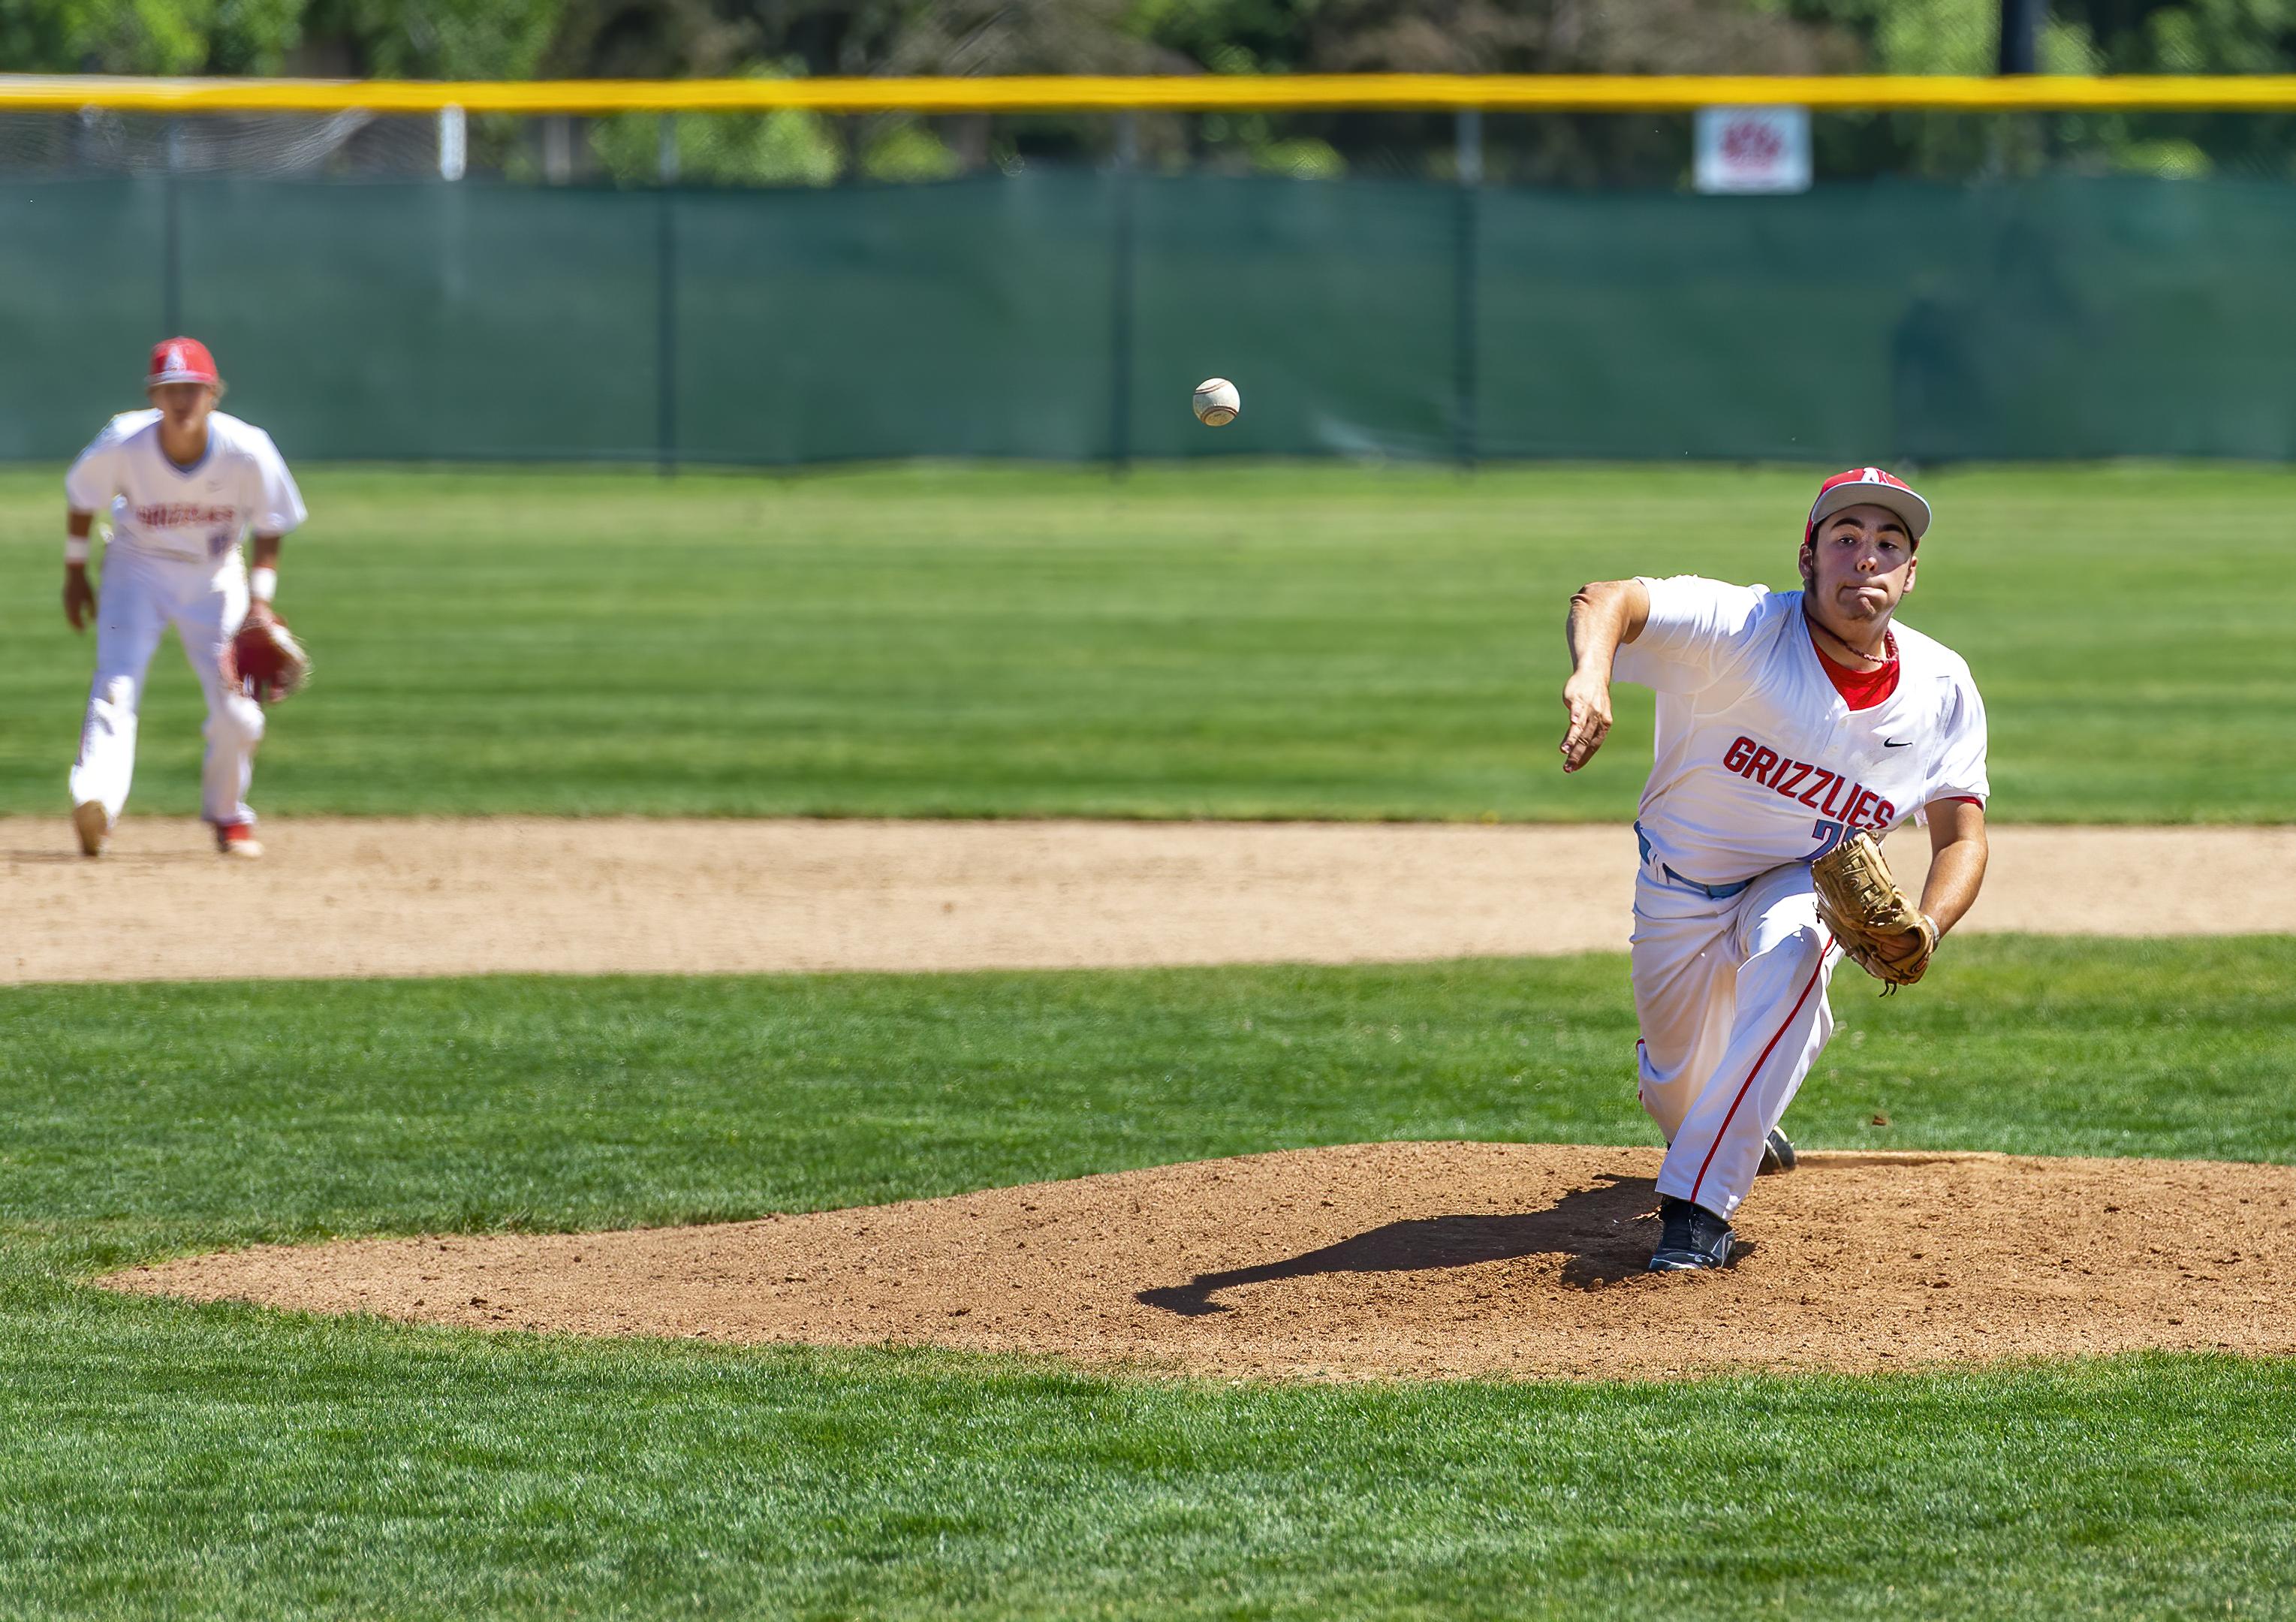 Ashland High School Baseball Tommy Hulick topaz ai denoise